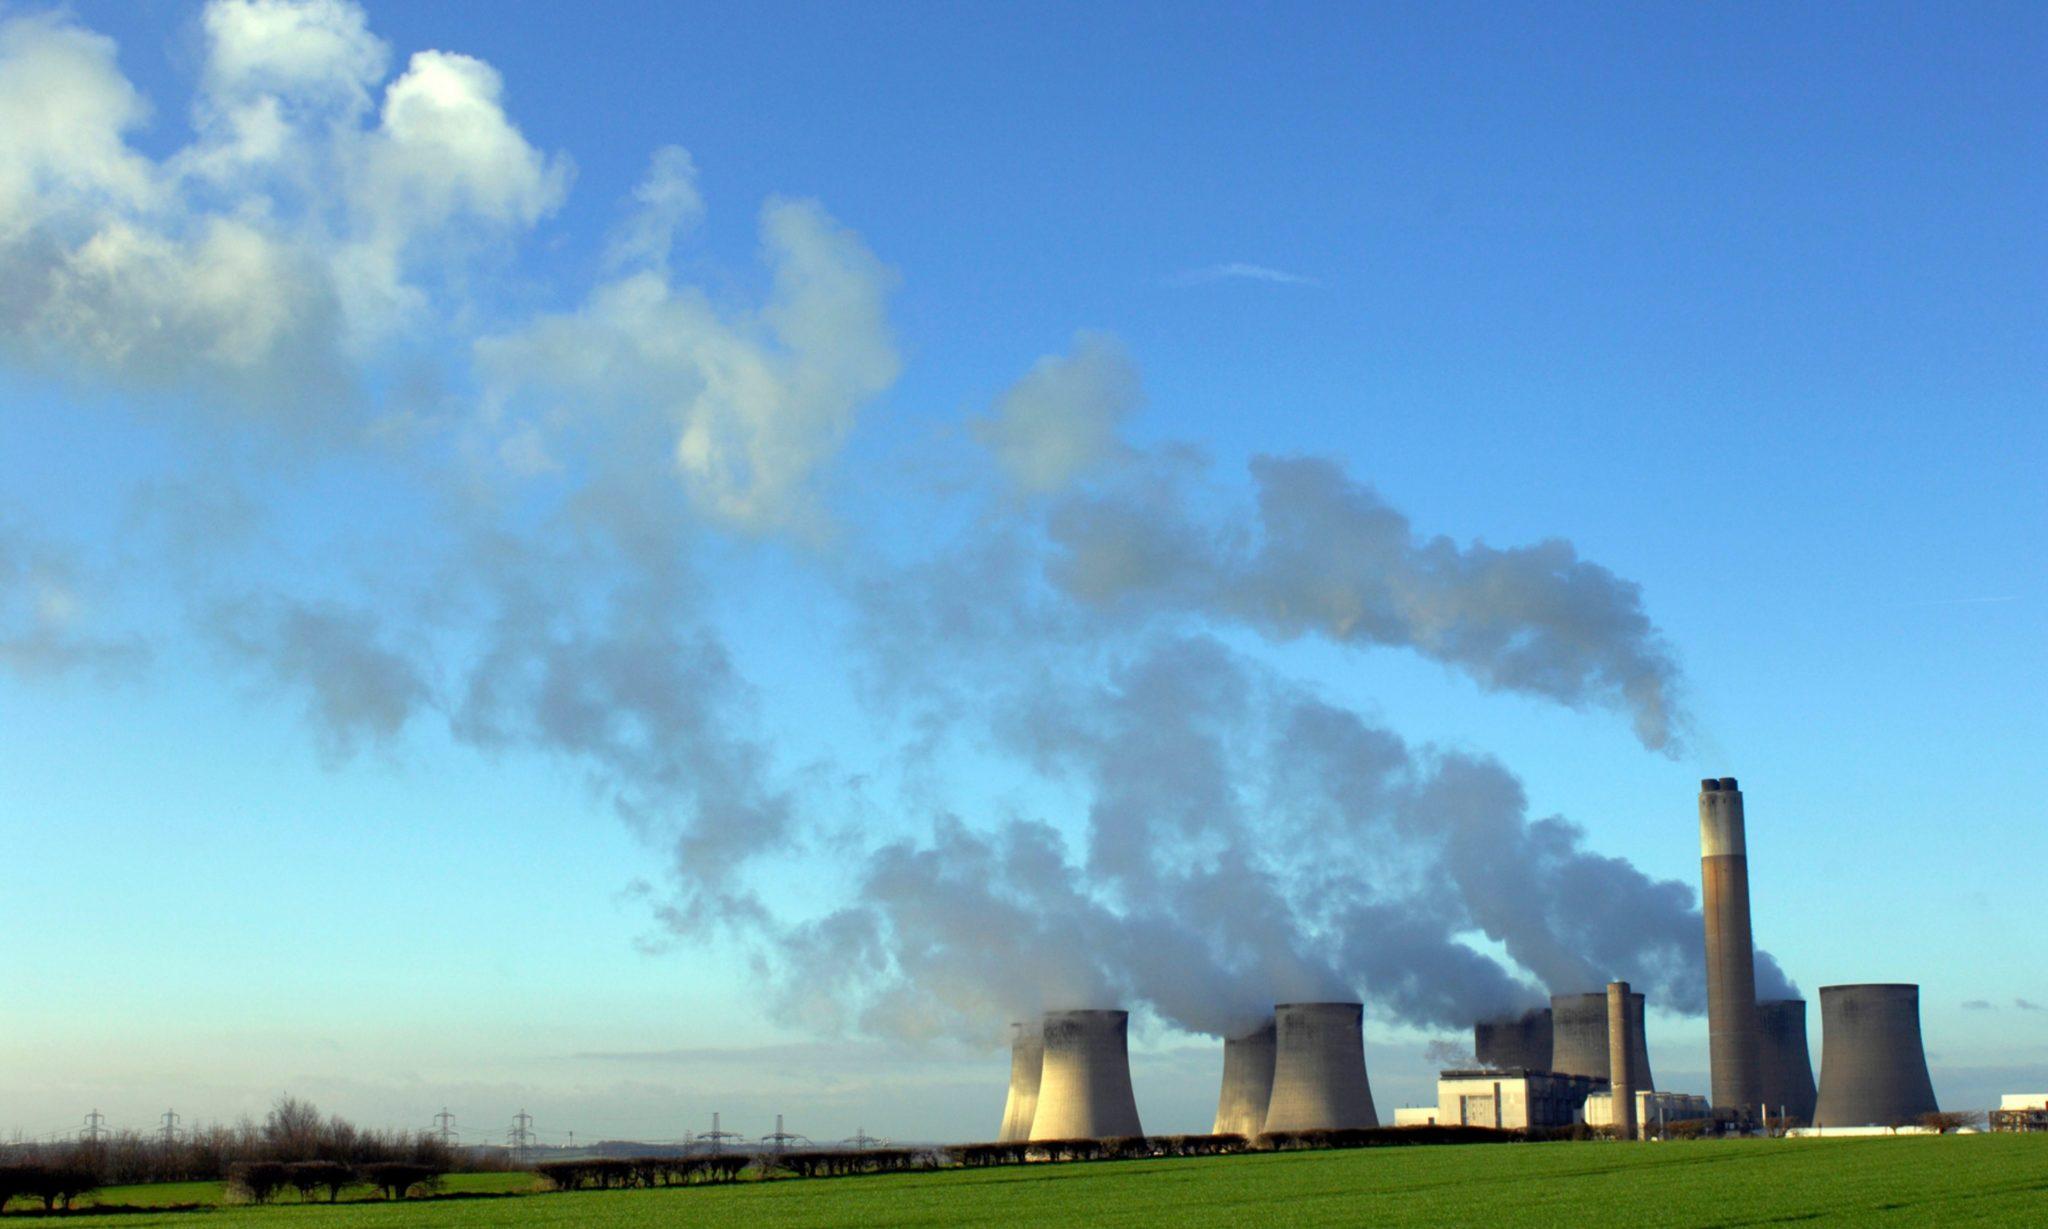 emissioni nell'ambiente